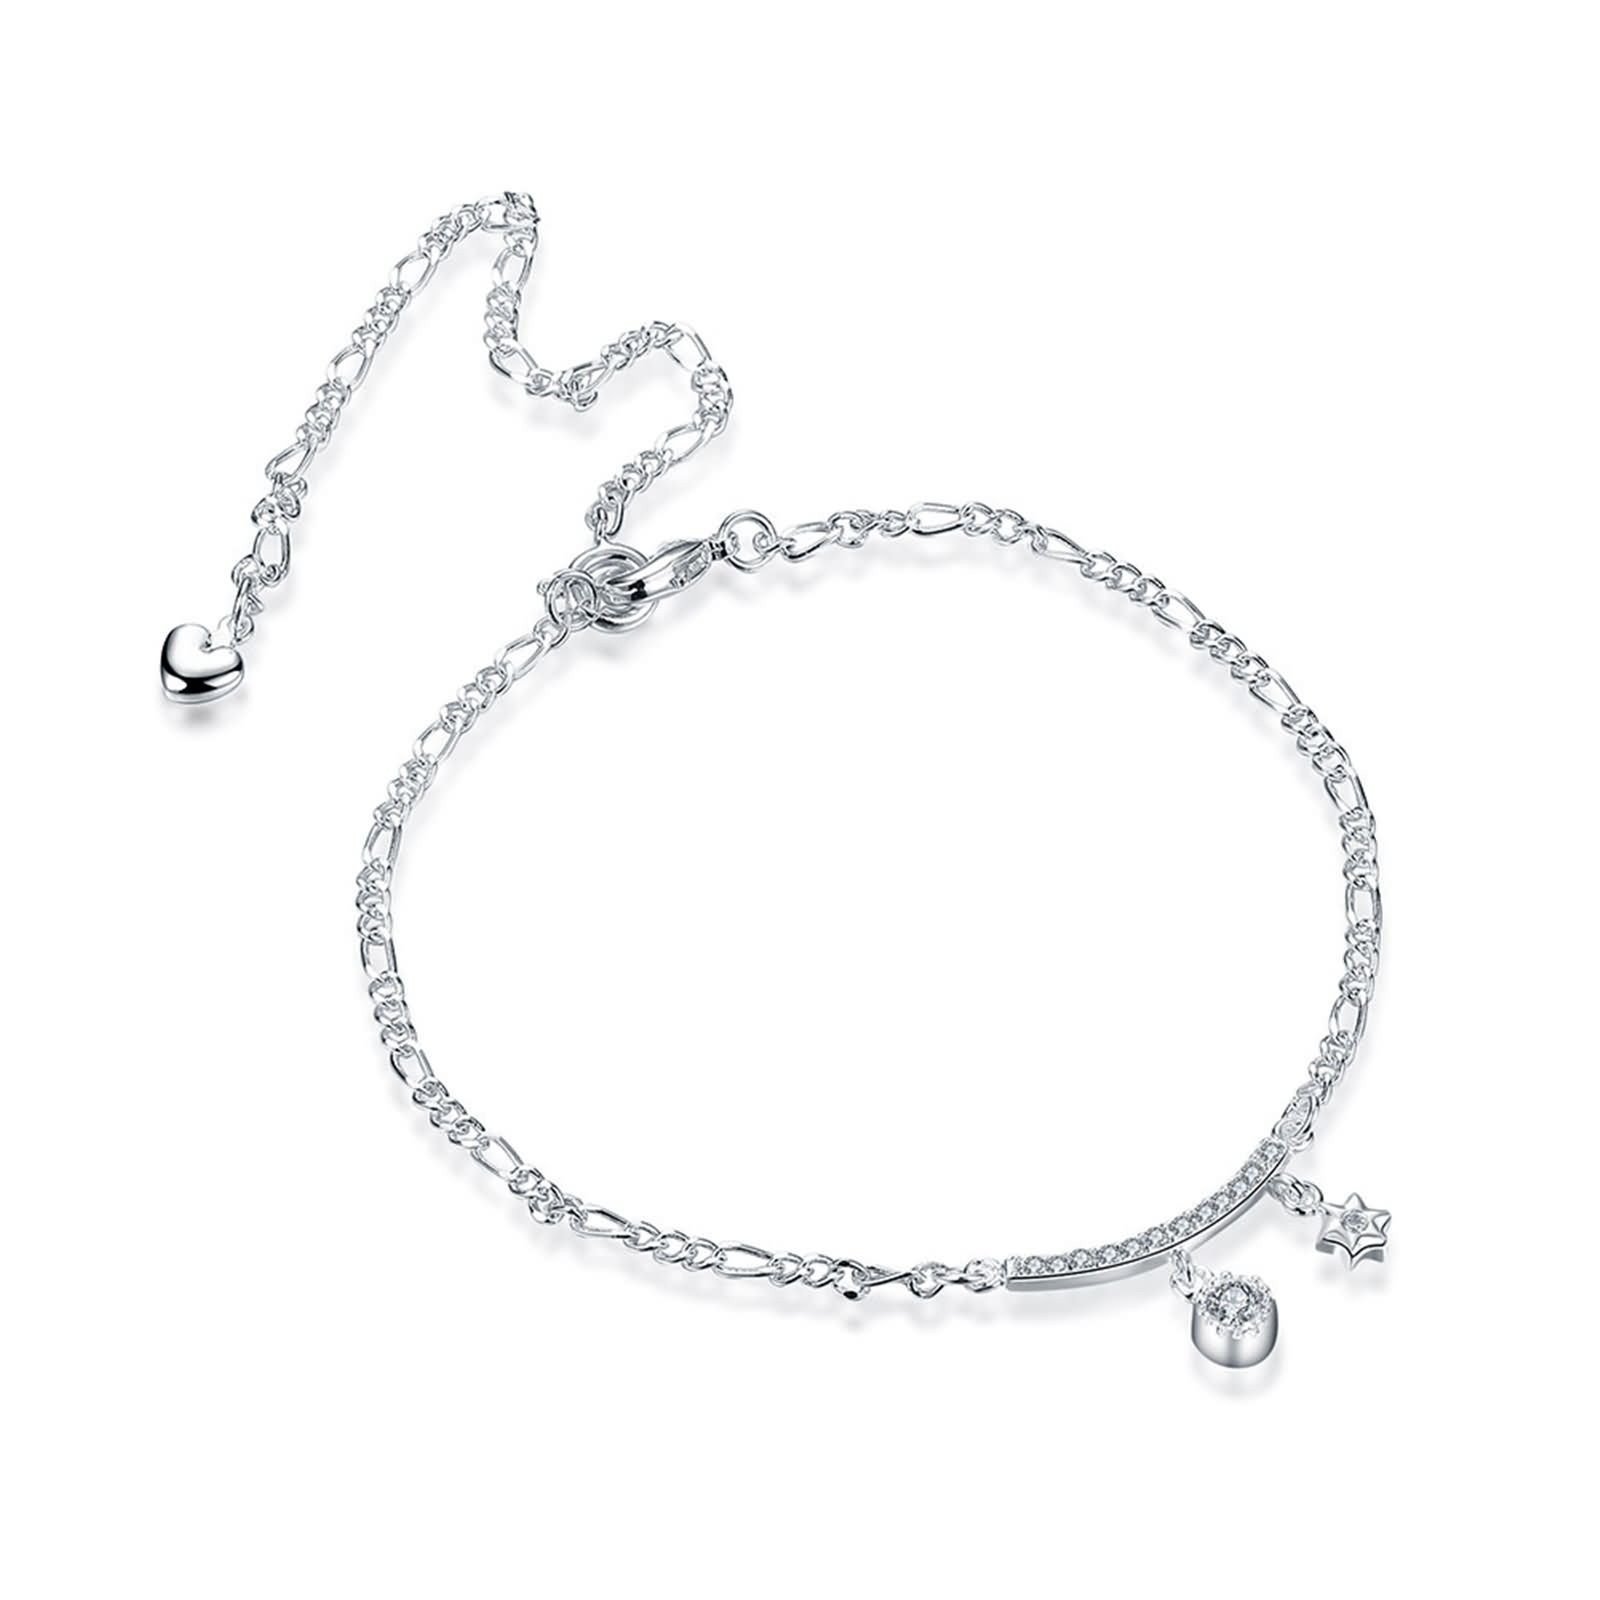 Bishilin Beach Foot Jewelry Wedding Hexagram anklet diamond 2.5 CM